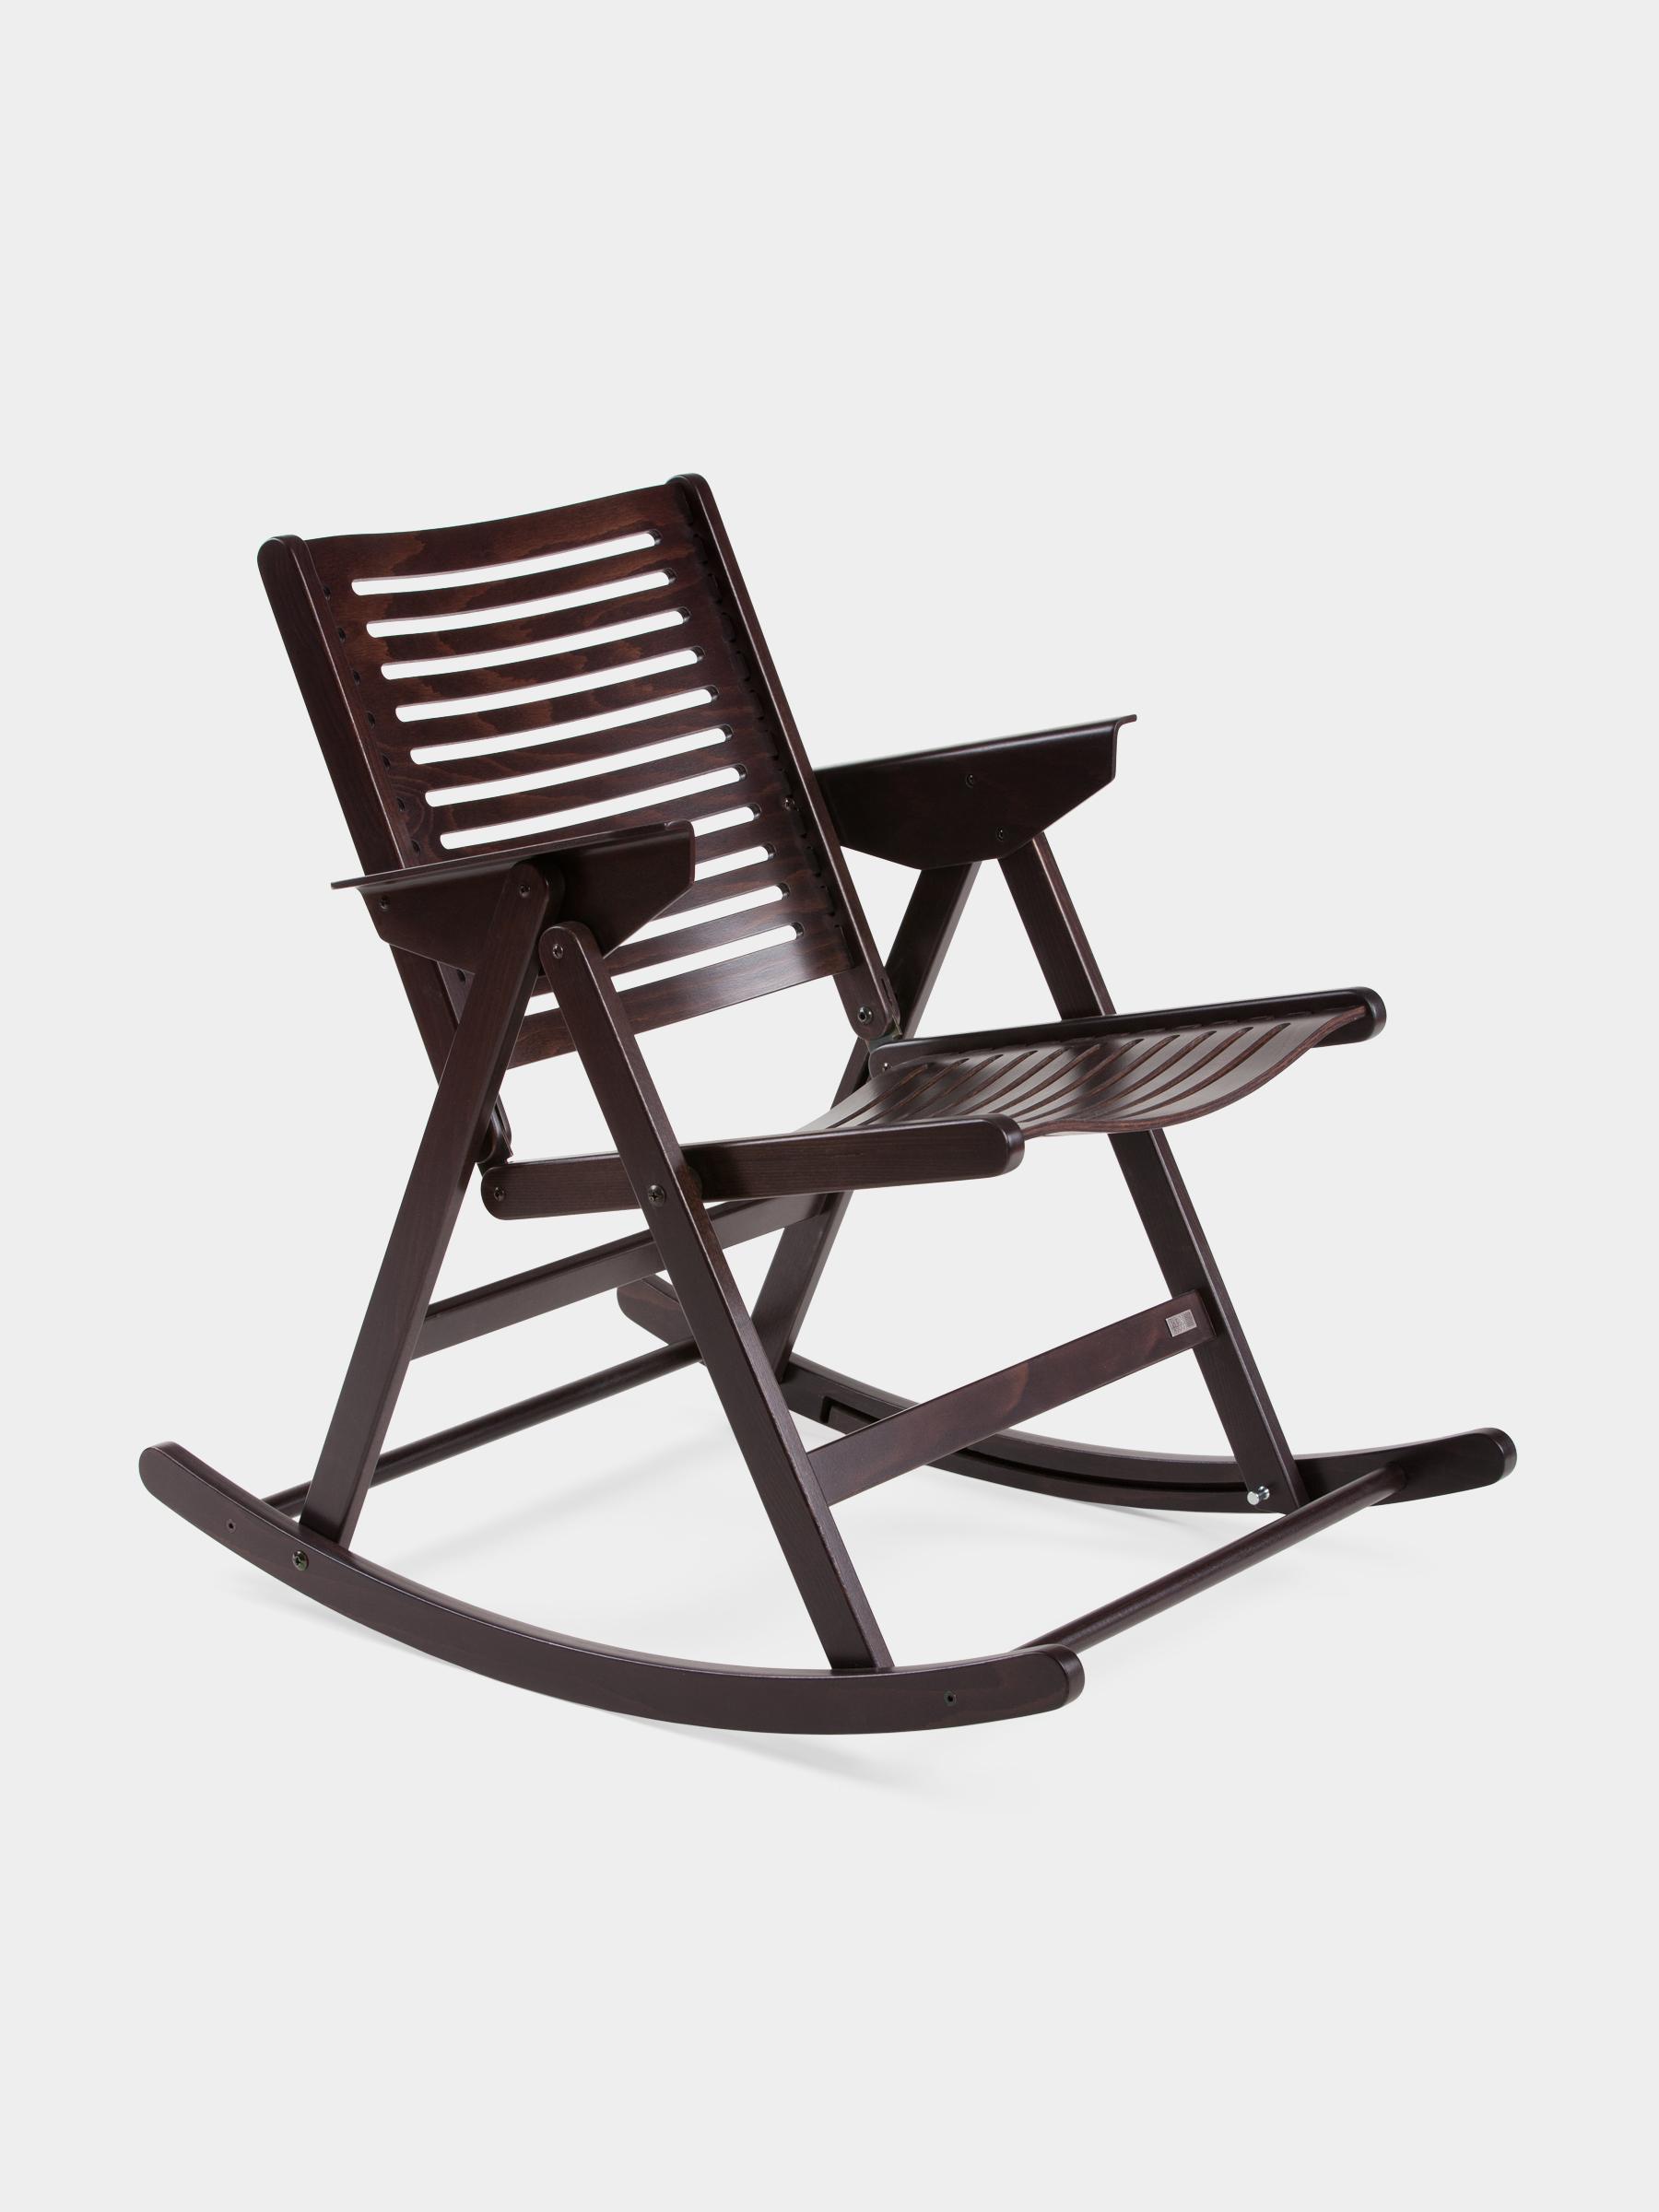 Rex_Kralj_Rocking_Chair chocolate